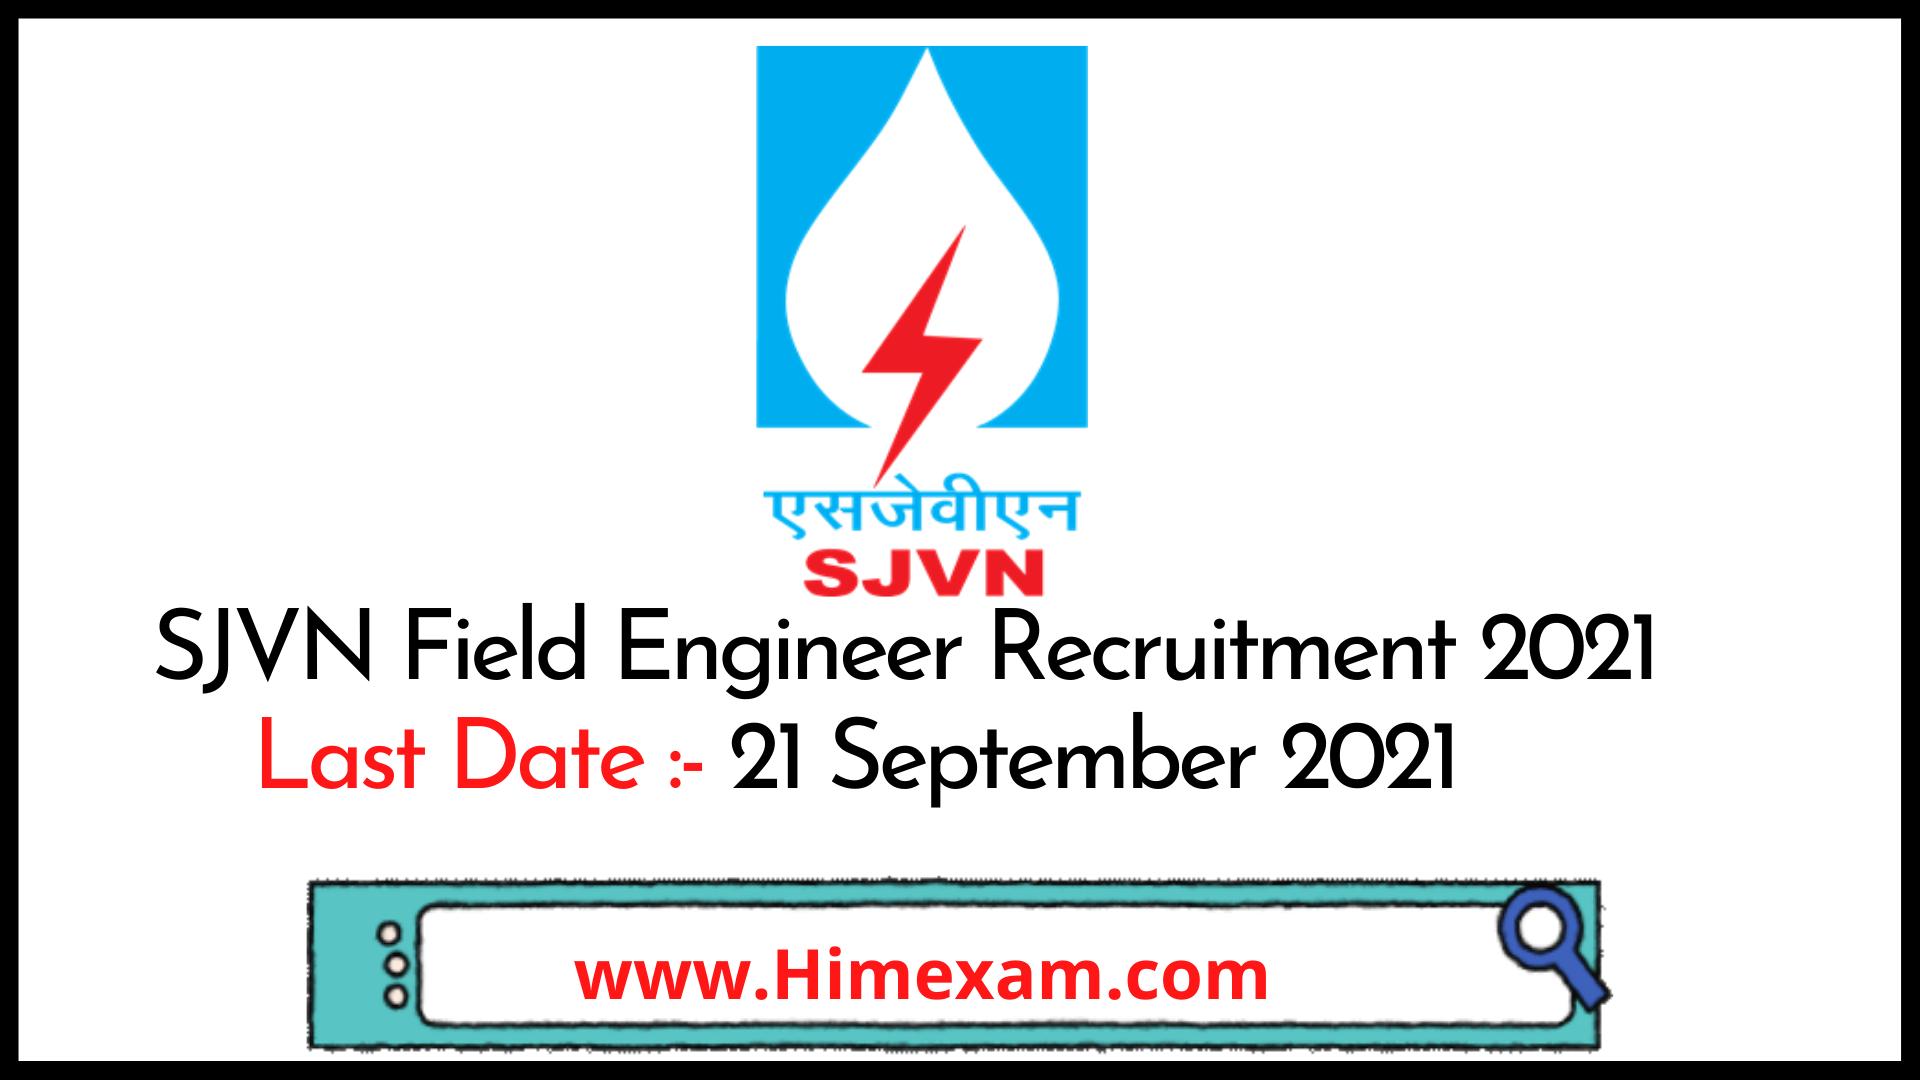 SJVN Field Engineer Recruitment 2021